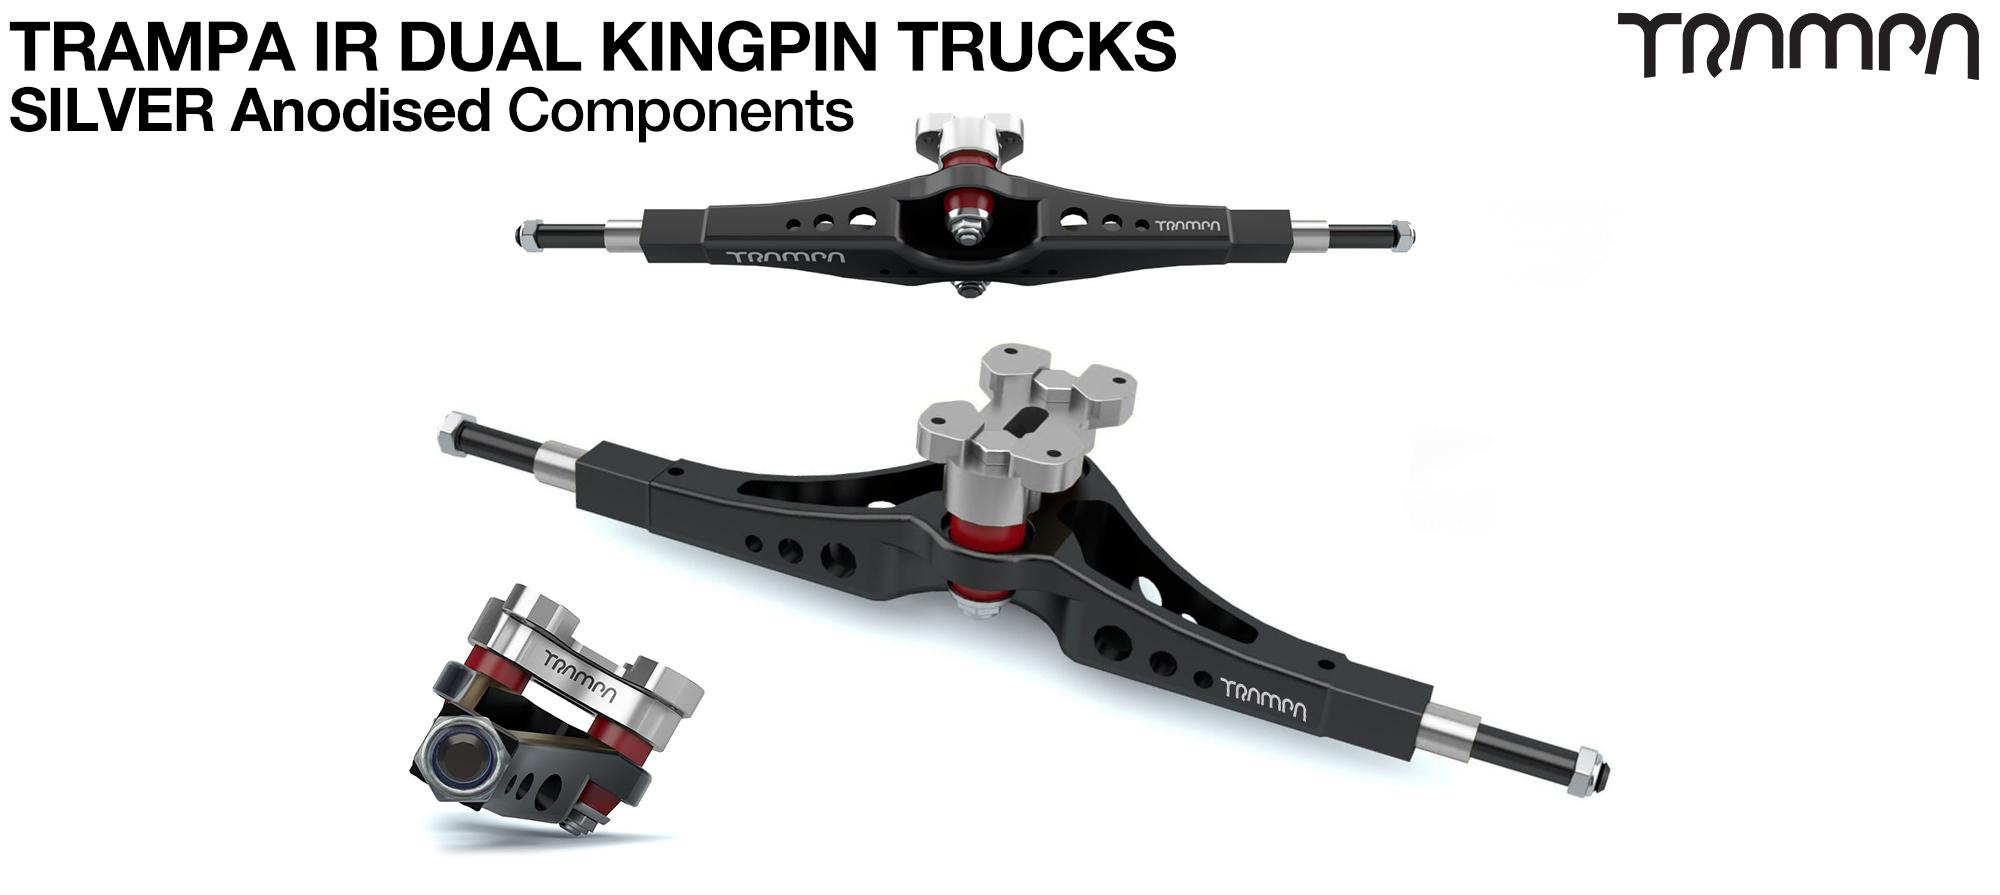 TRAMPA IR Double Kingpinned Skate Style Trucks fit every 19.1mm Motor Mount TRAMPA offers - SILVER